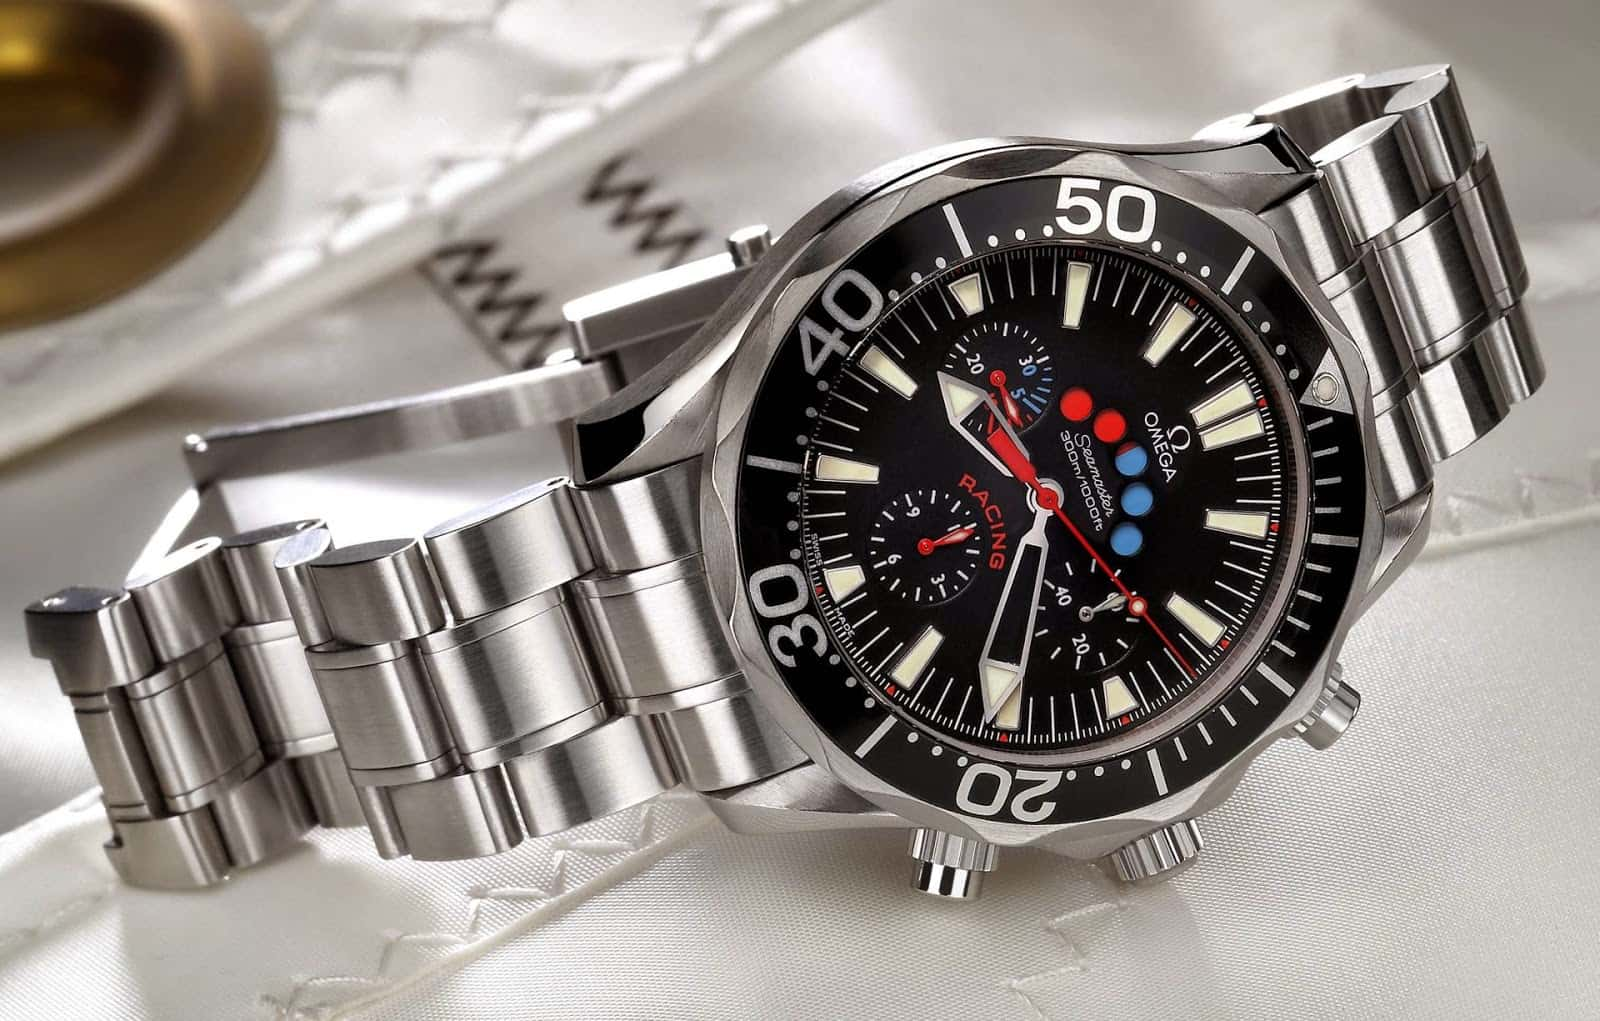 OMEGA Seamaster Chronograph Regatta Countdown Timer 2